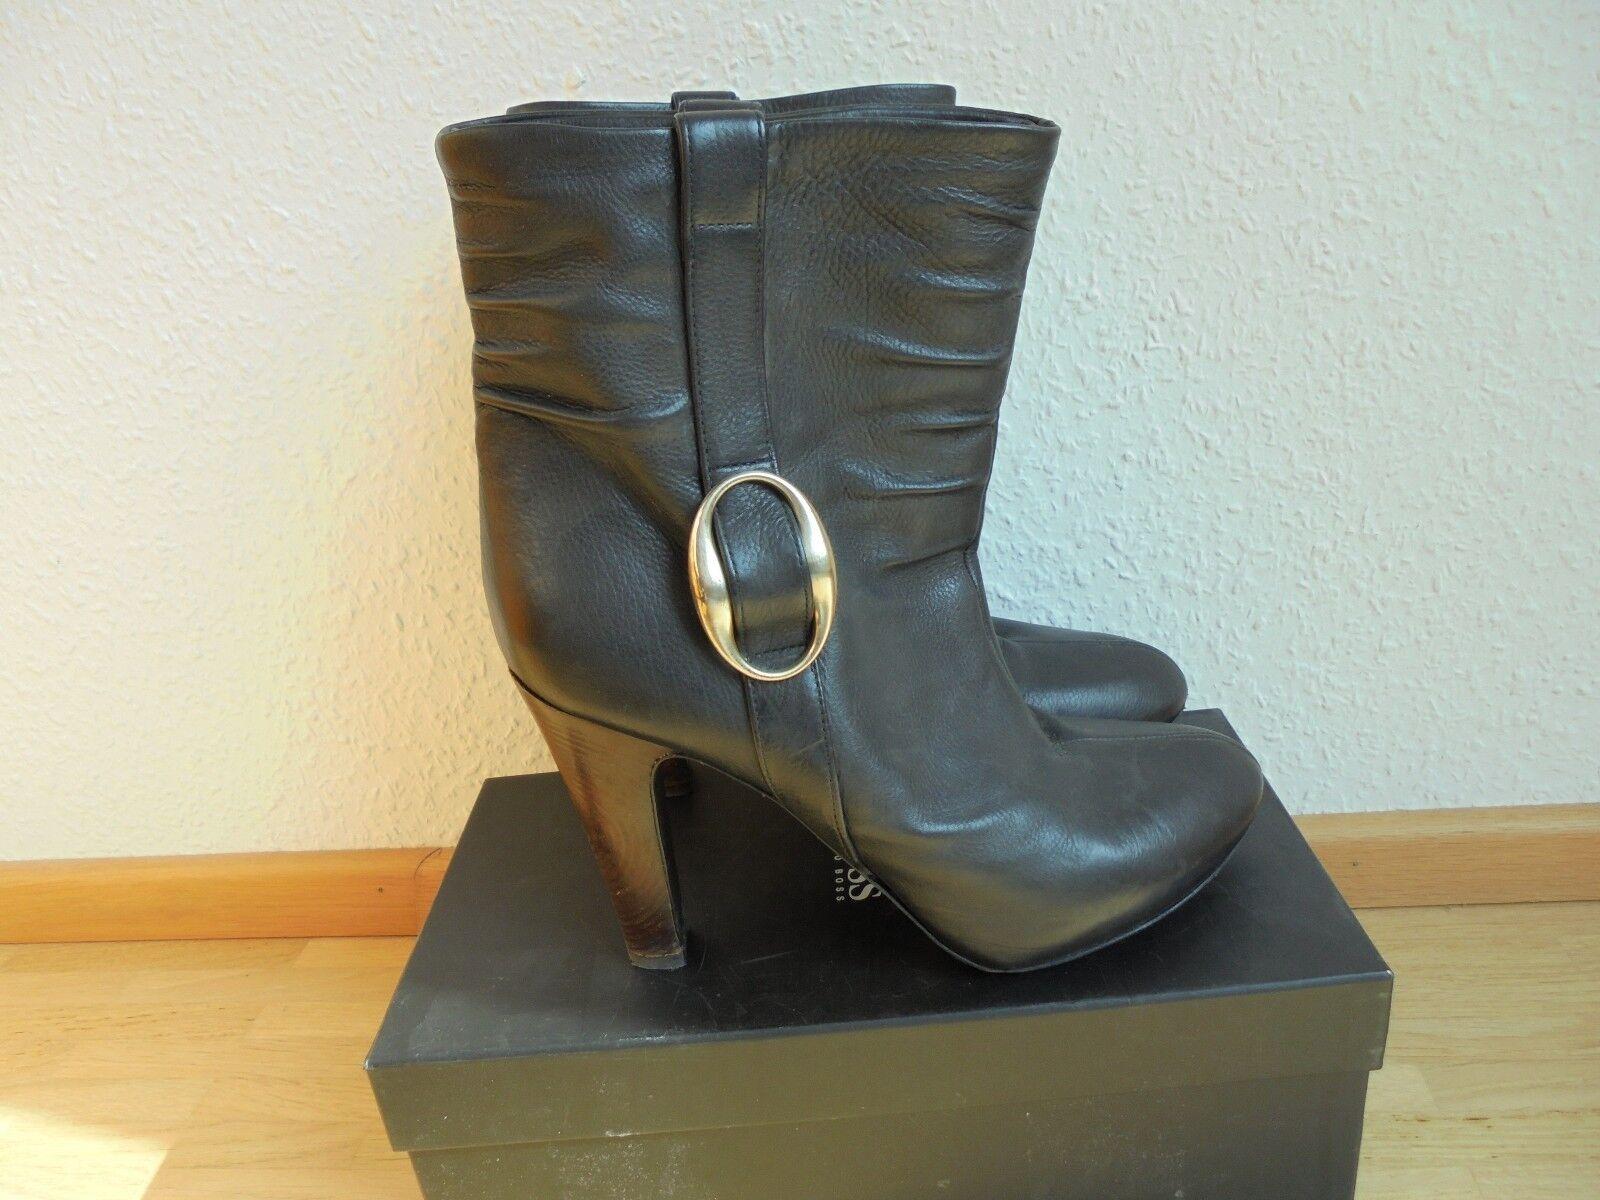 Hugo Boss Stiefel Leder Stiefeletten NP:  w NEU Pumps Stiefel Boss Schuhe Gr. 39 4691a8